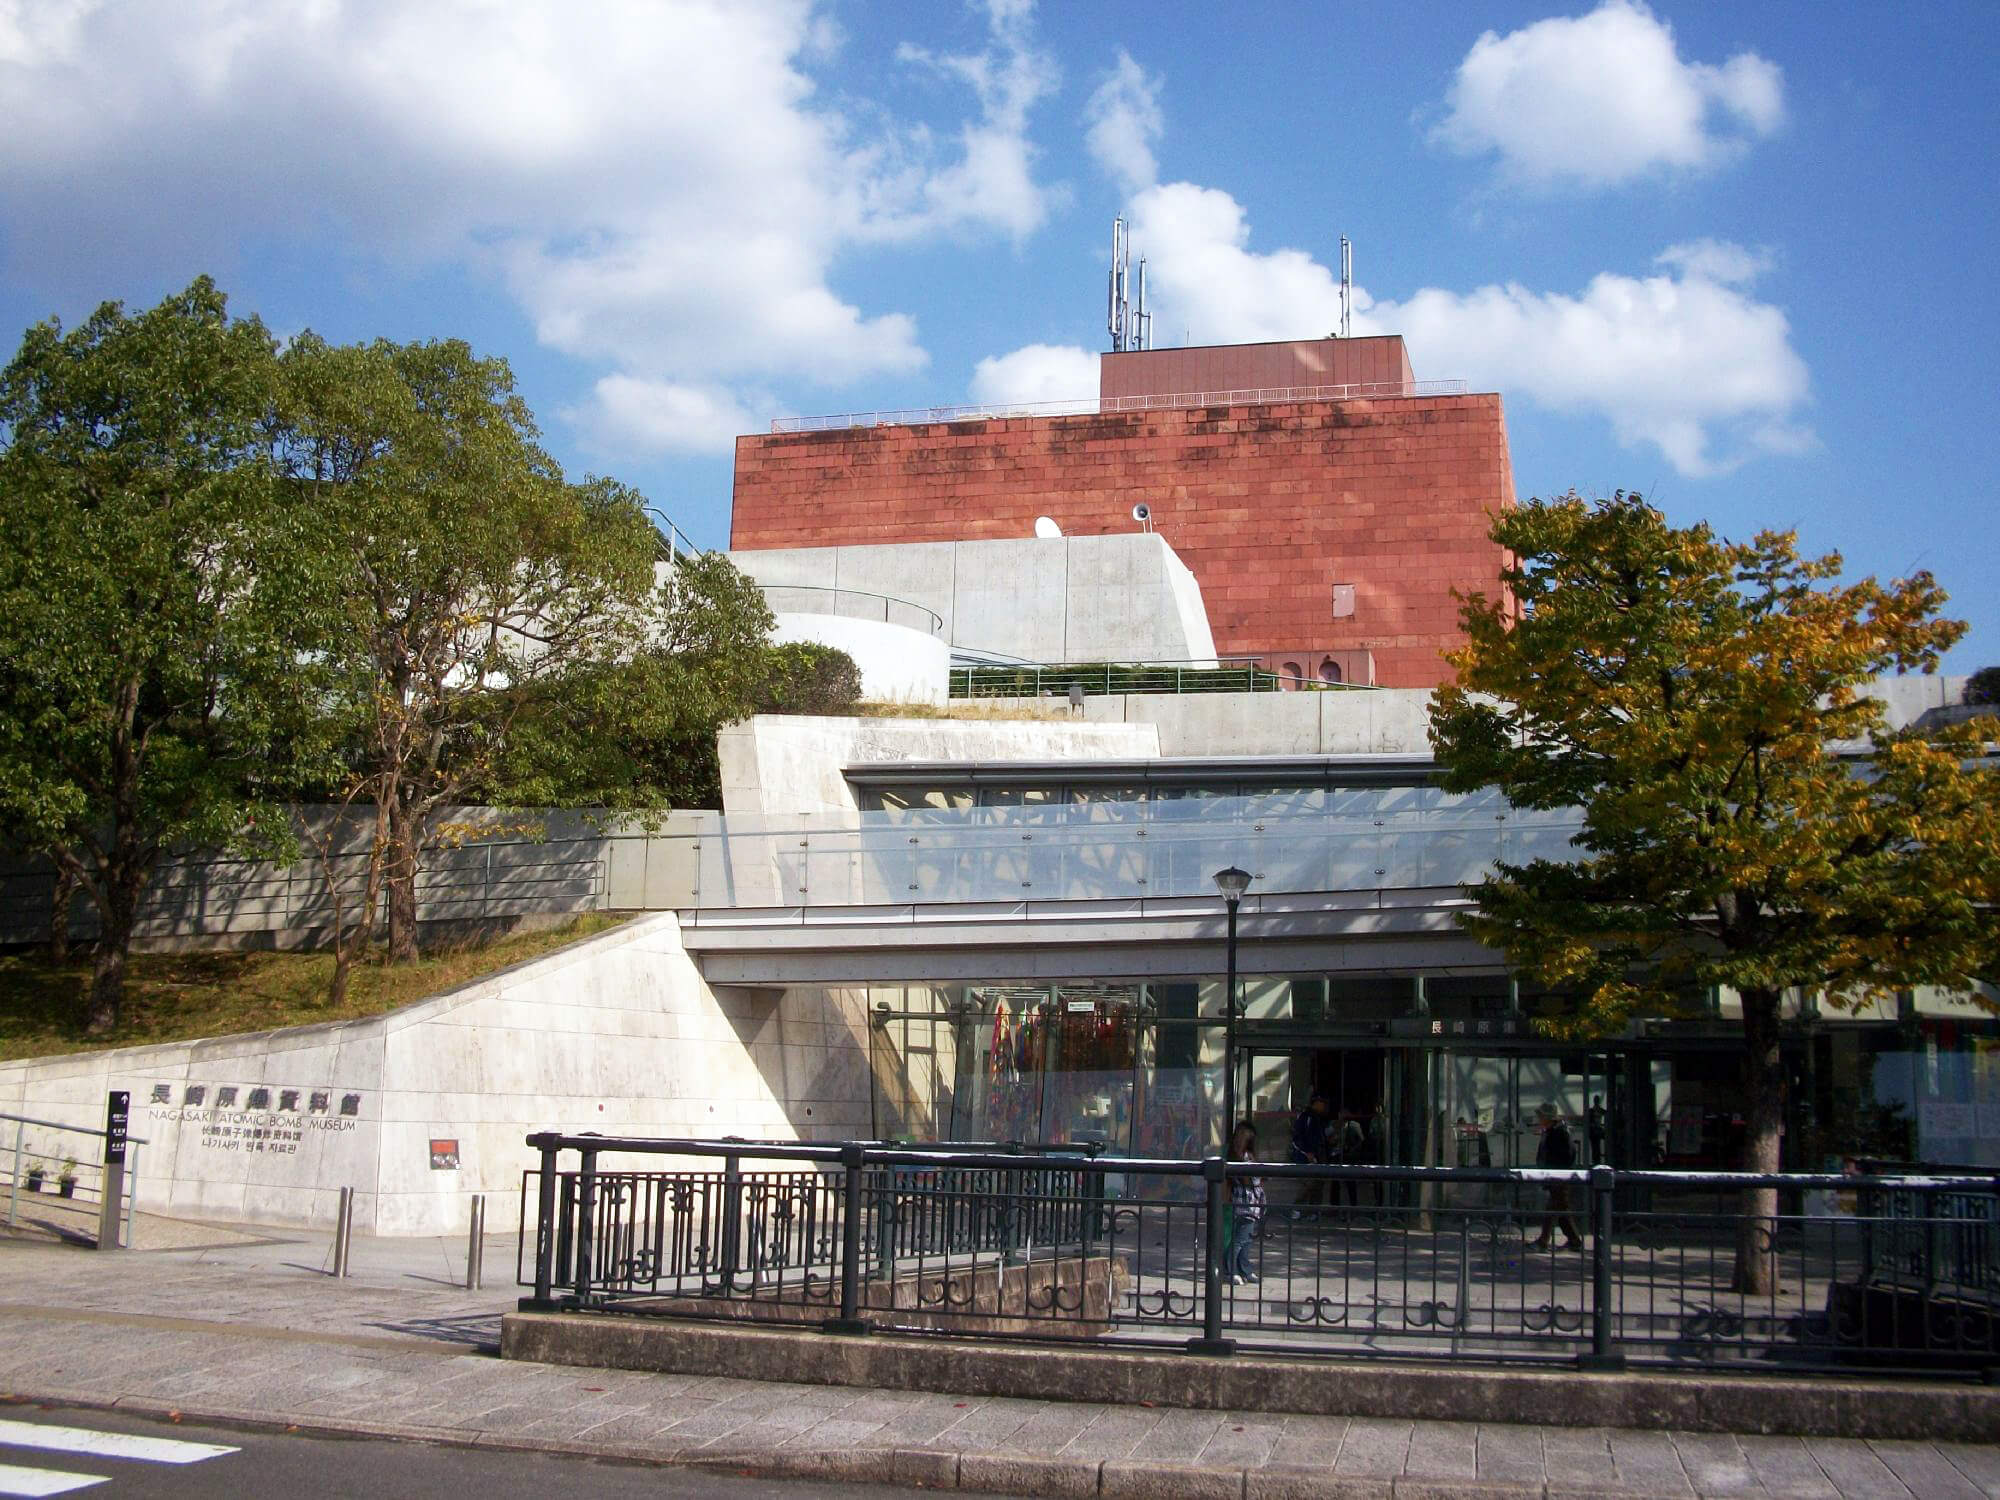 Trip Advisor 長崎原爆資料館 Nagasaki Atomic Bomb Museum